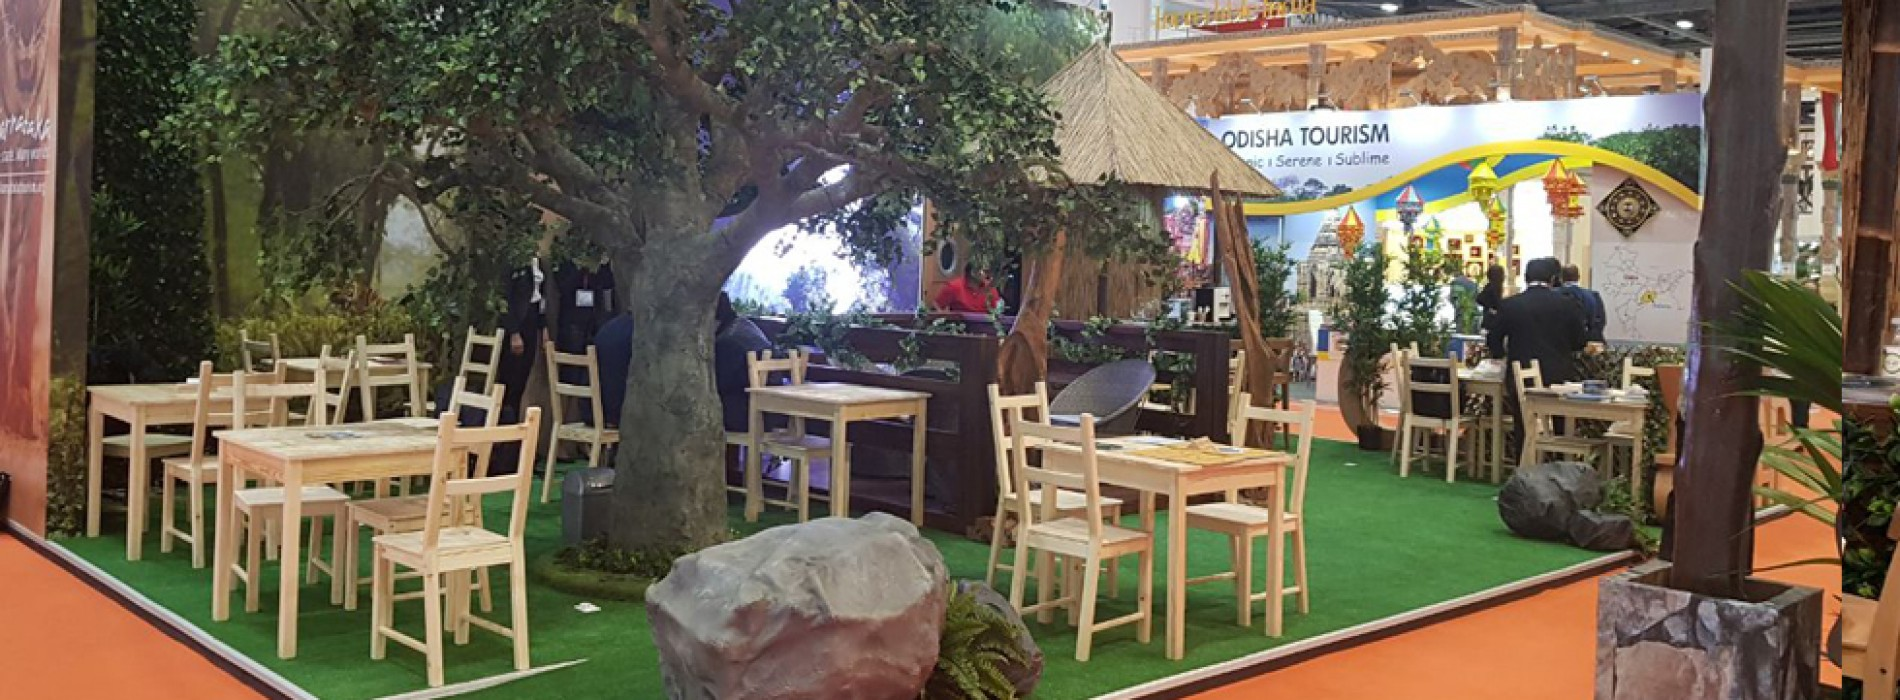 Karnataka showcases its wild side at World Travel Market 2017